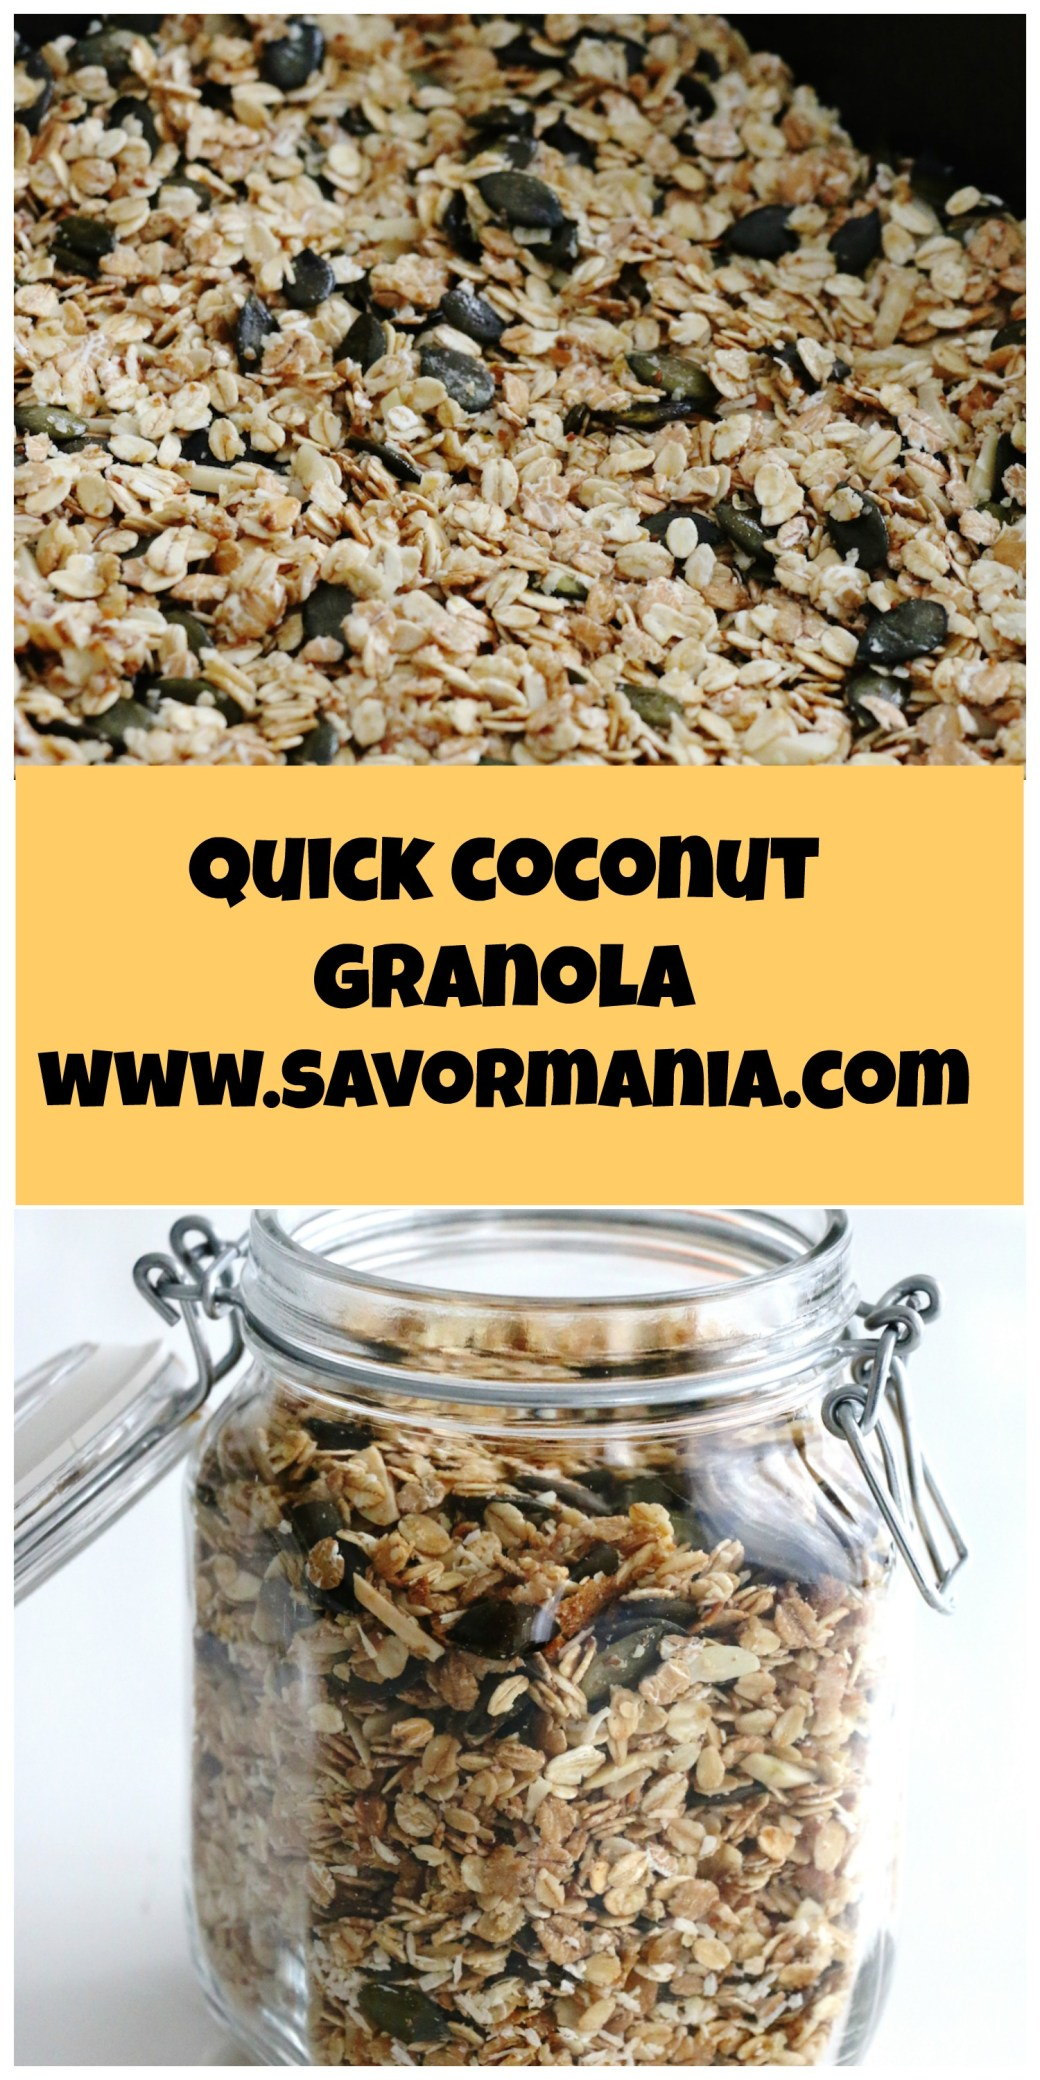 quick coconut granola   www.savormania.com